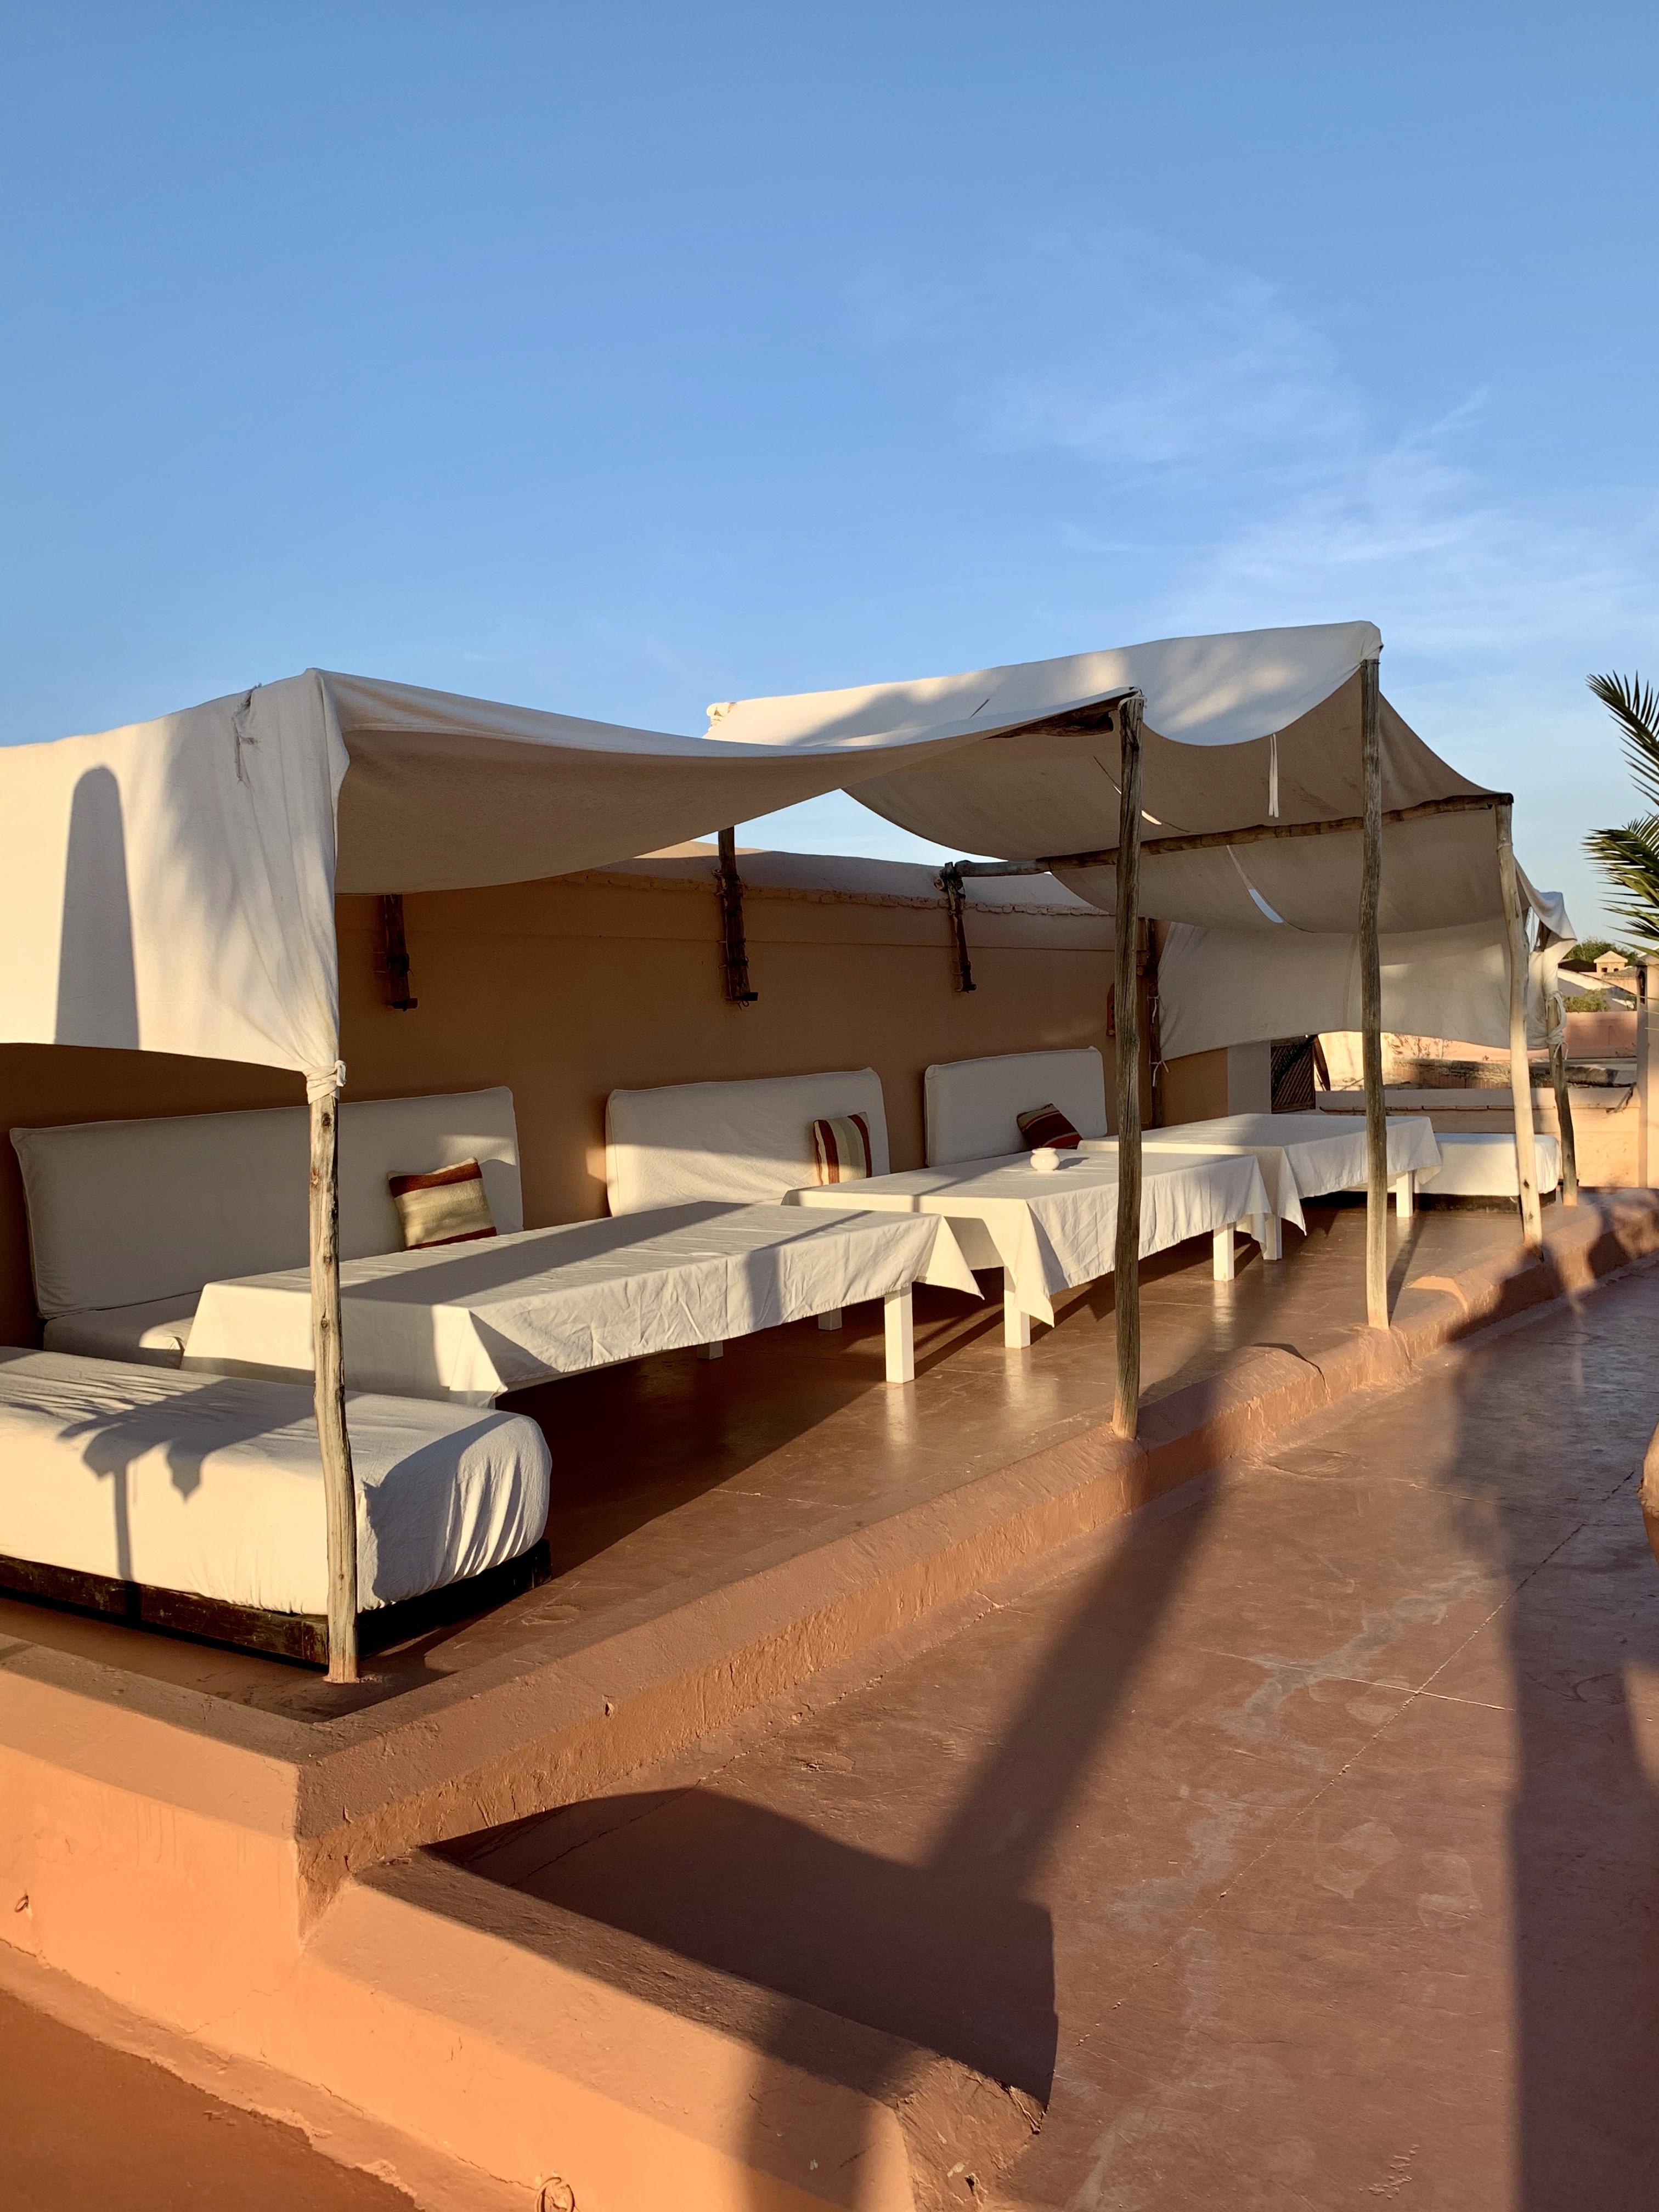 img 5737 - Marrakech, Morocco